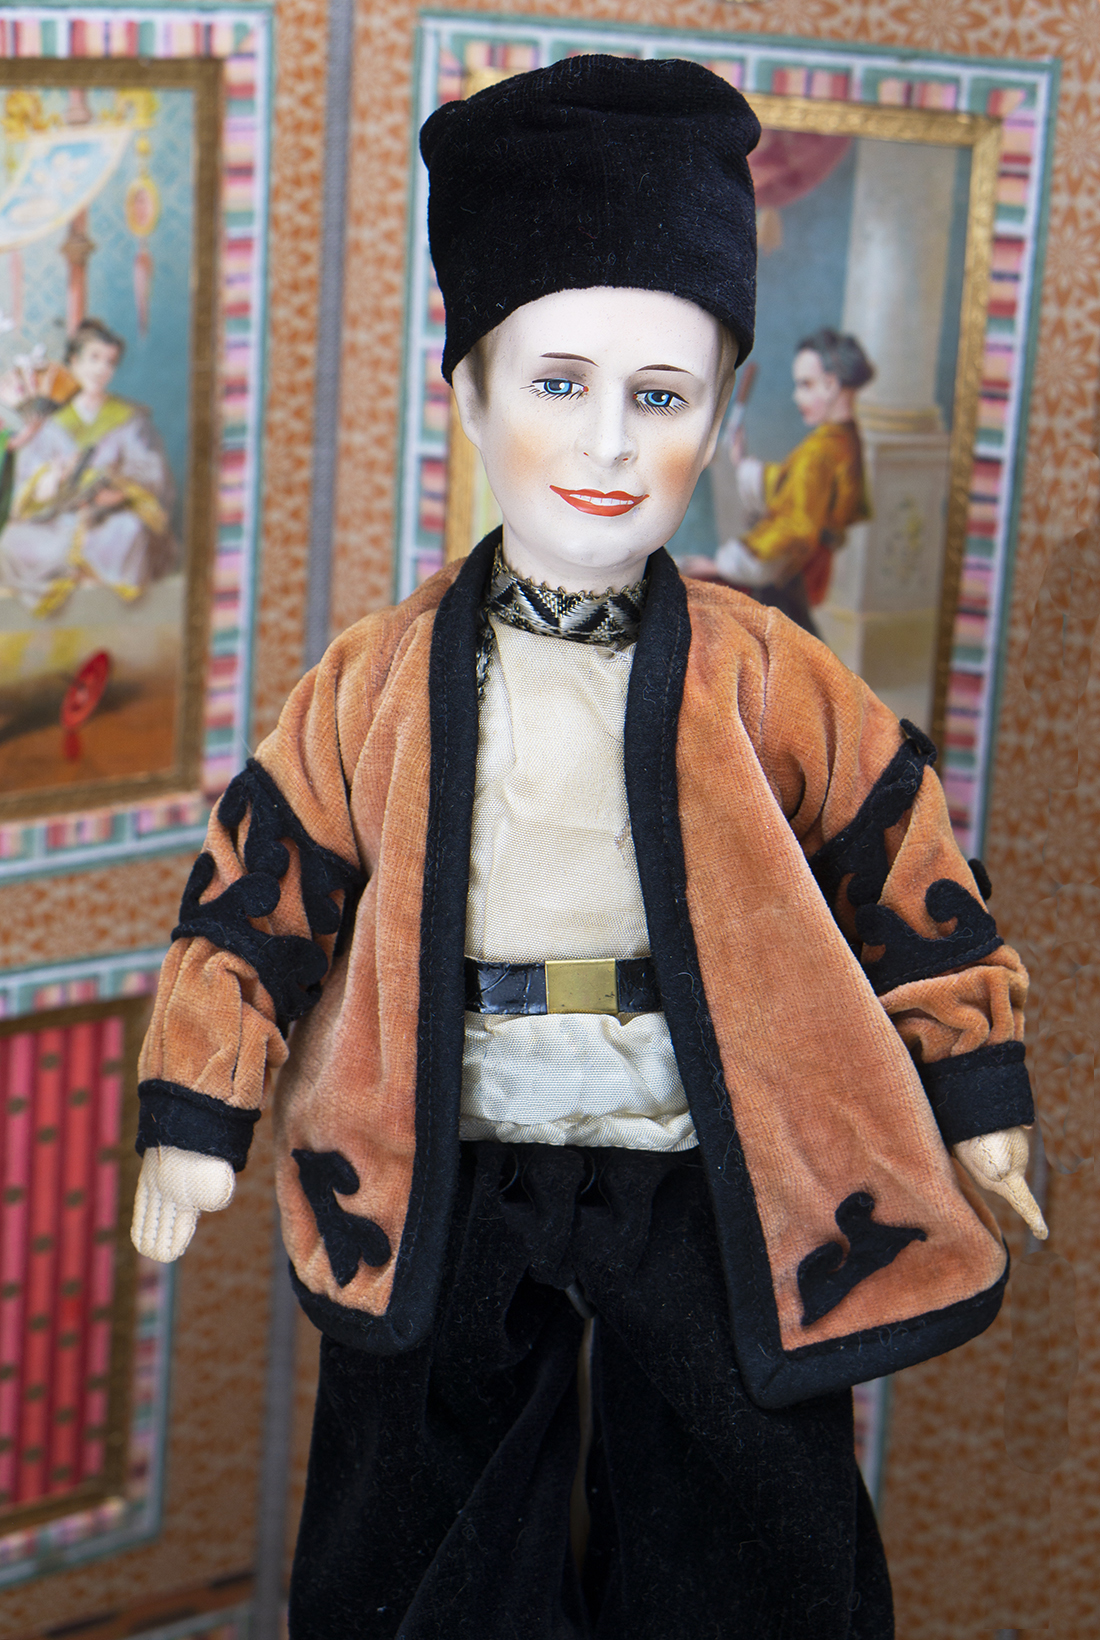 34 см Русская кукла Вацлав Нижинский - Париж, 1920е годы